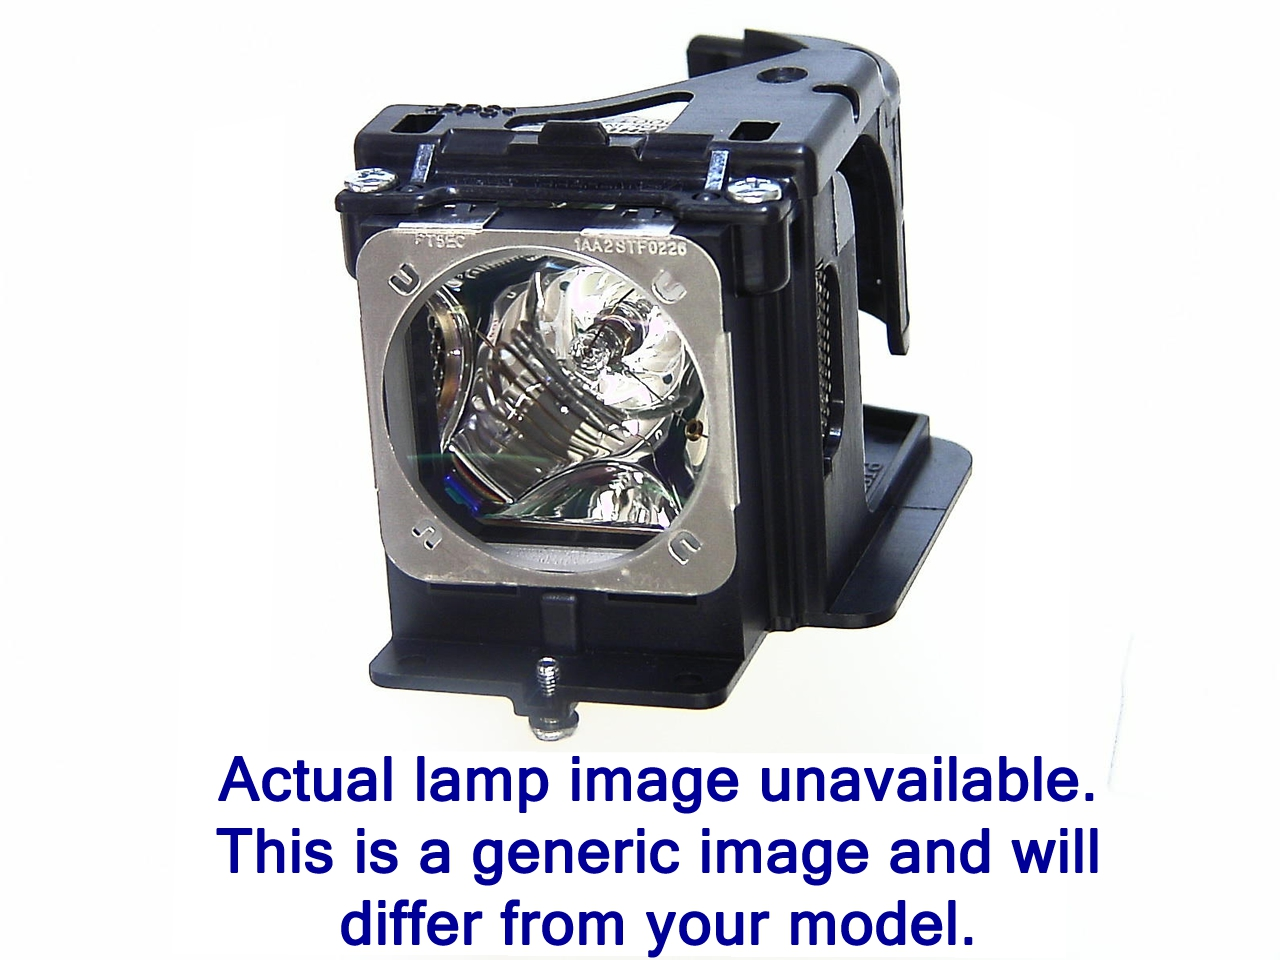 Lámpara LG RU-52SZ51D (Philips bulb)